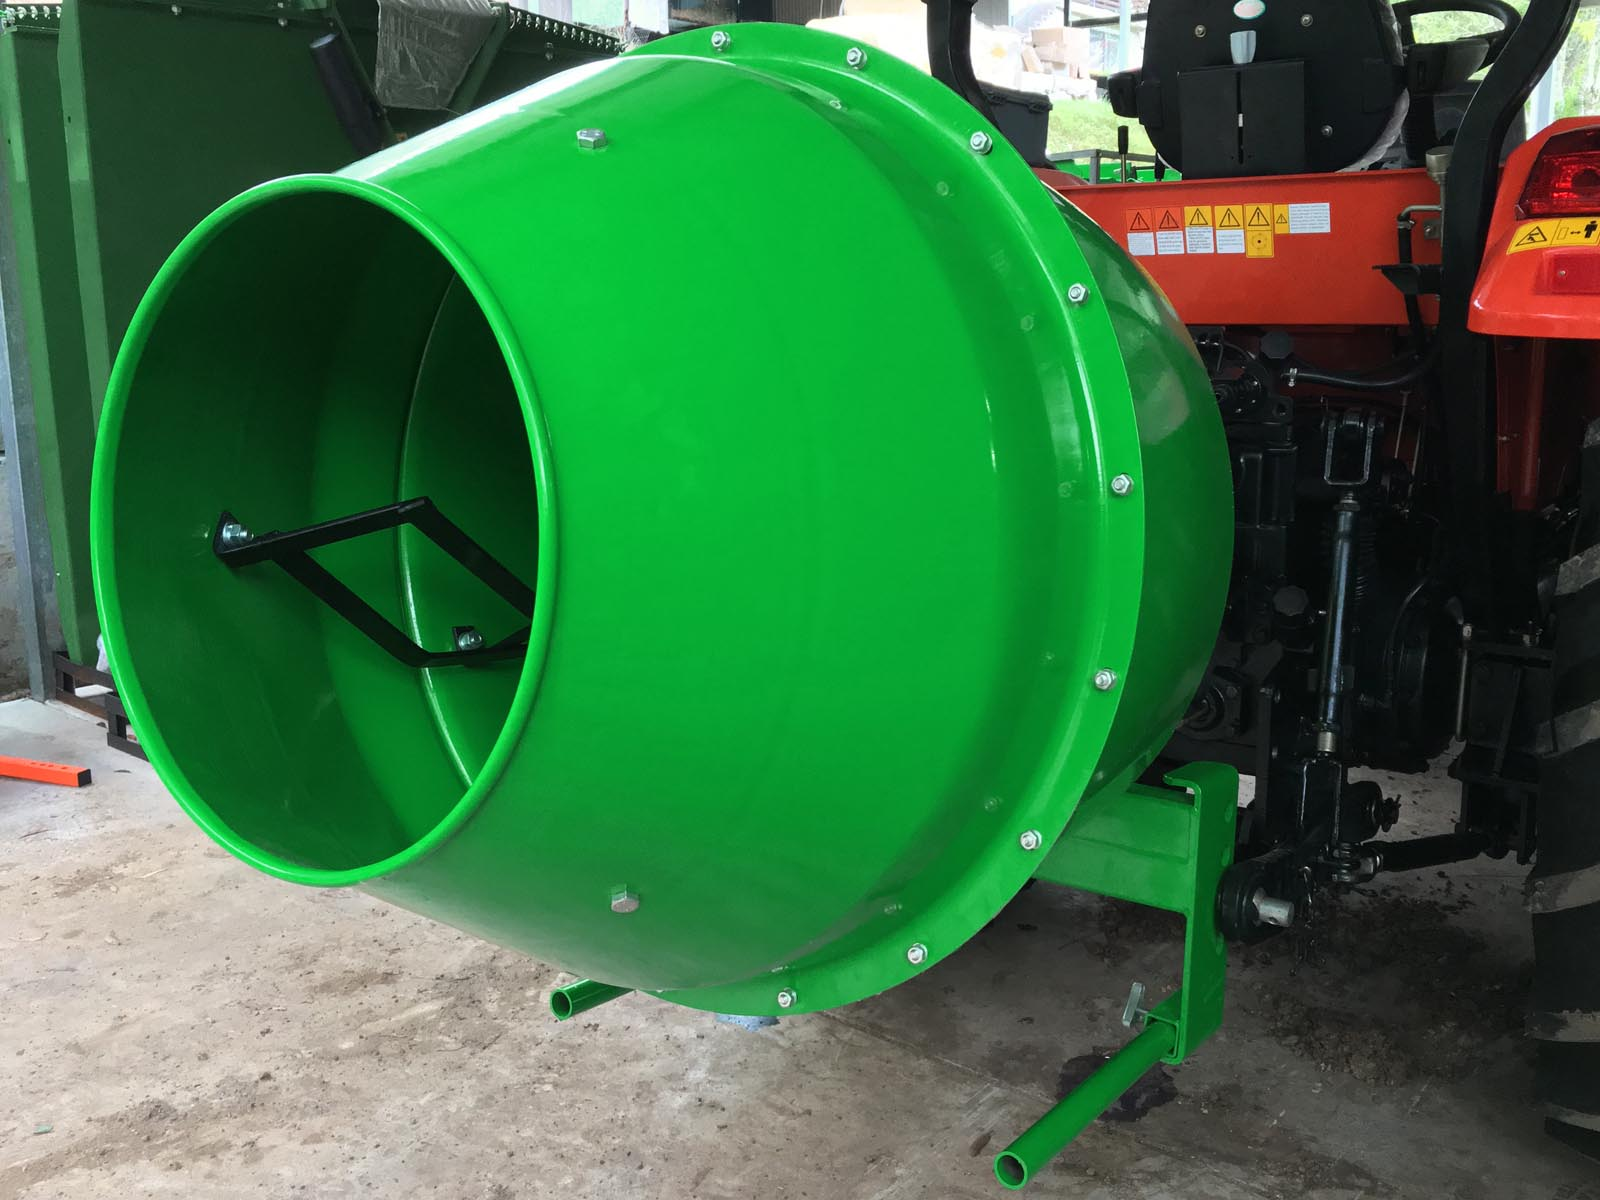 Discount Tractors 3 Point Cement Mixer